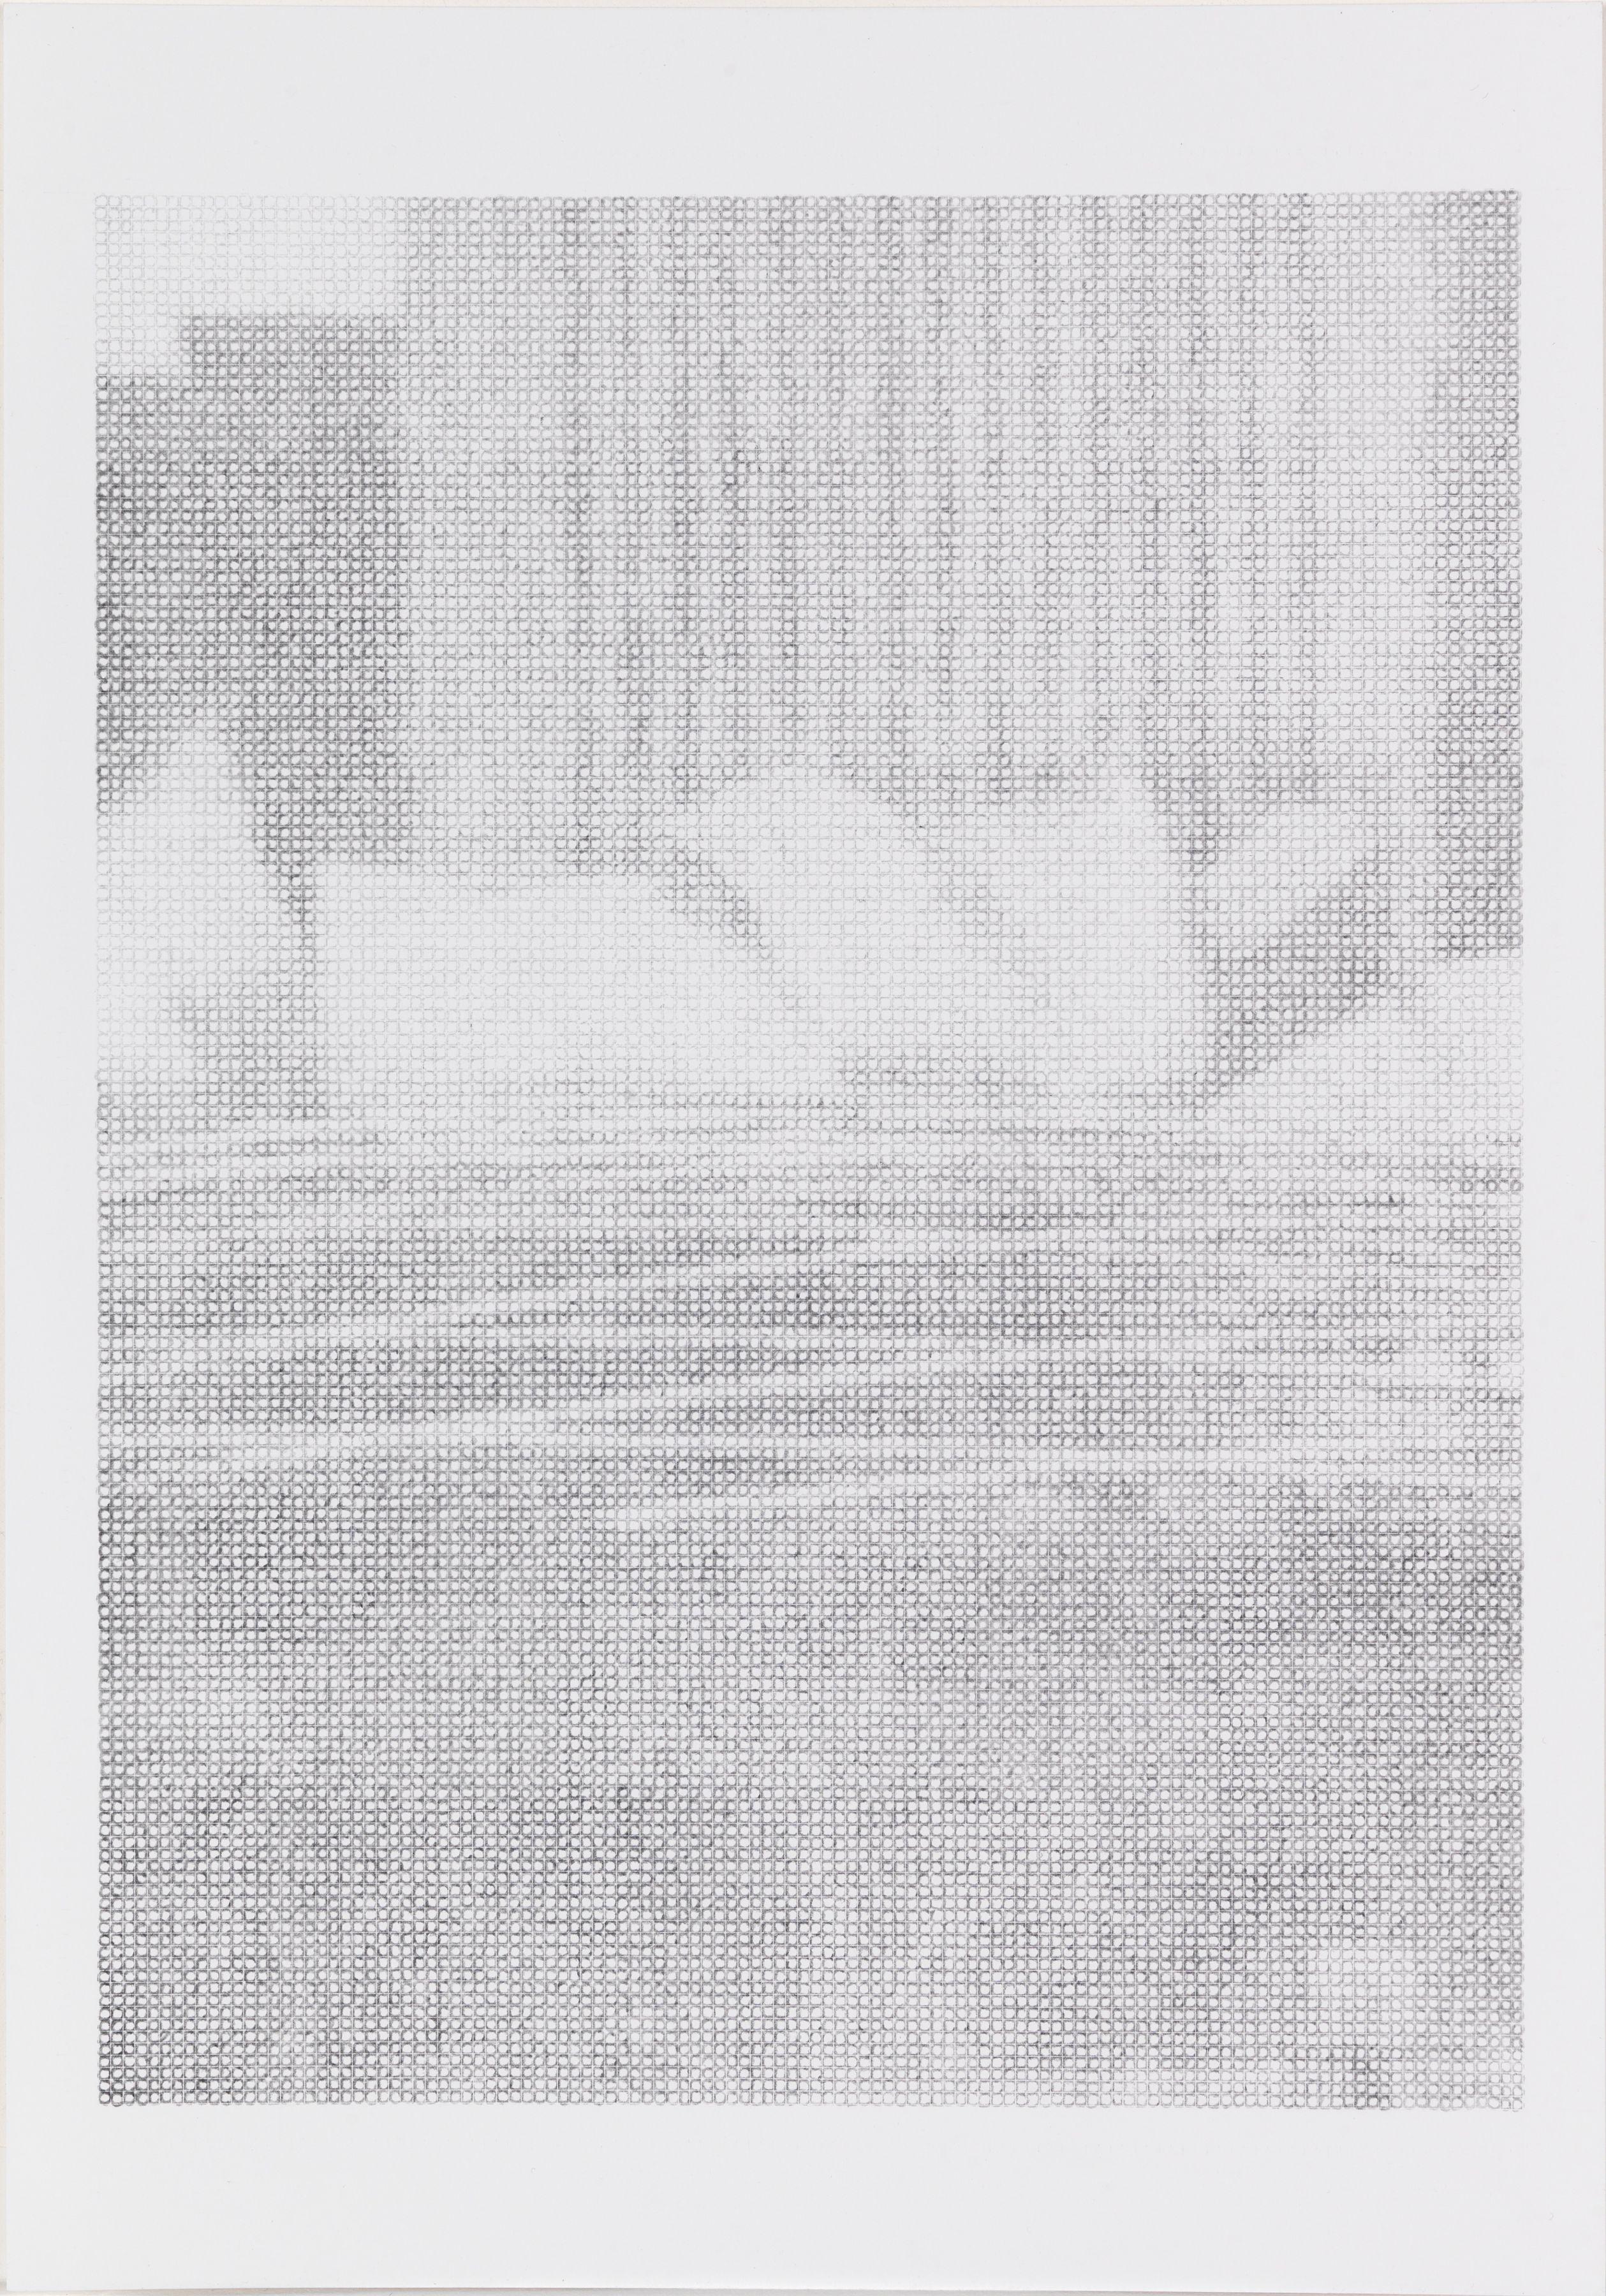 Ewan Gibbs Chicago Music Pavillion Ink and graphite on paper